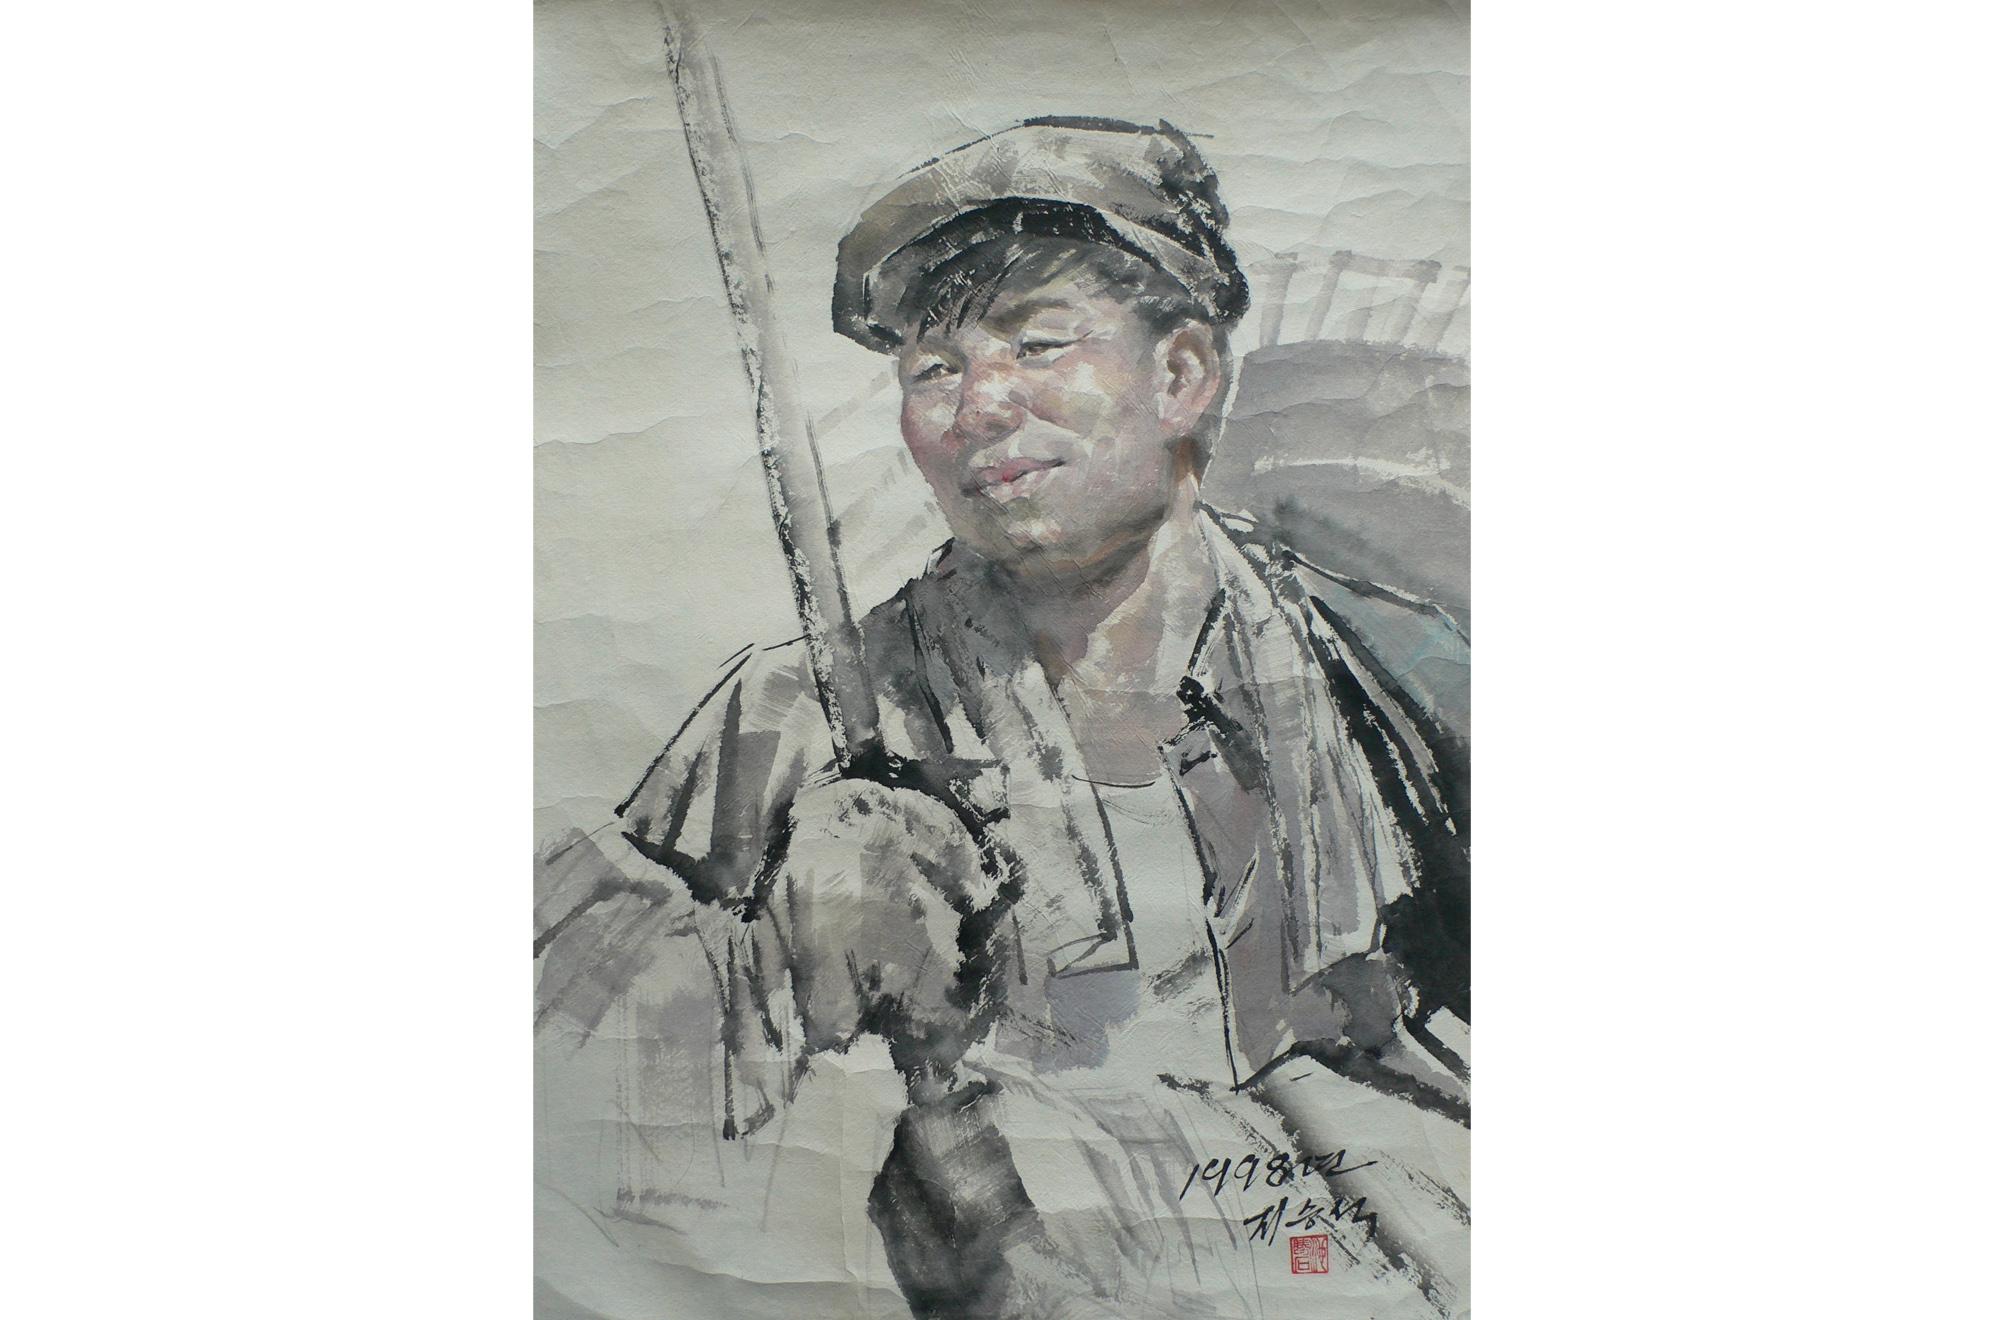 North Korean portrait